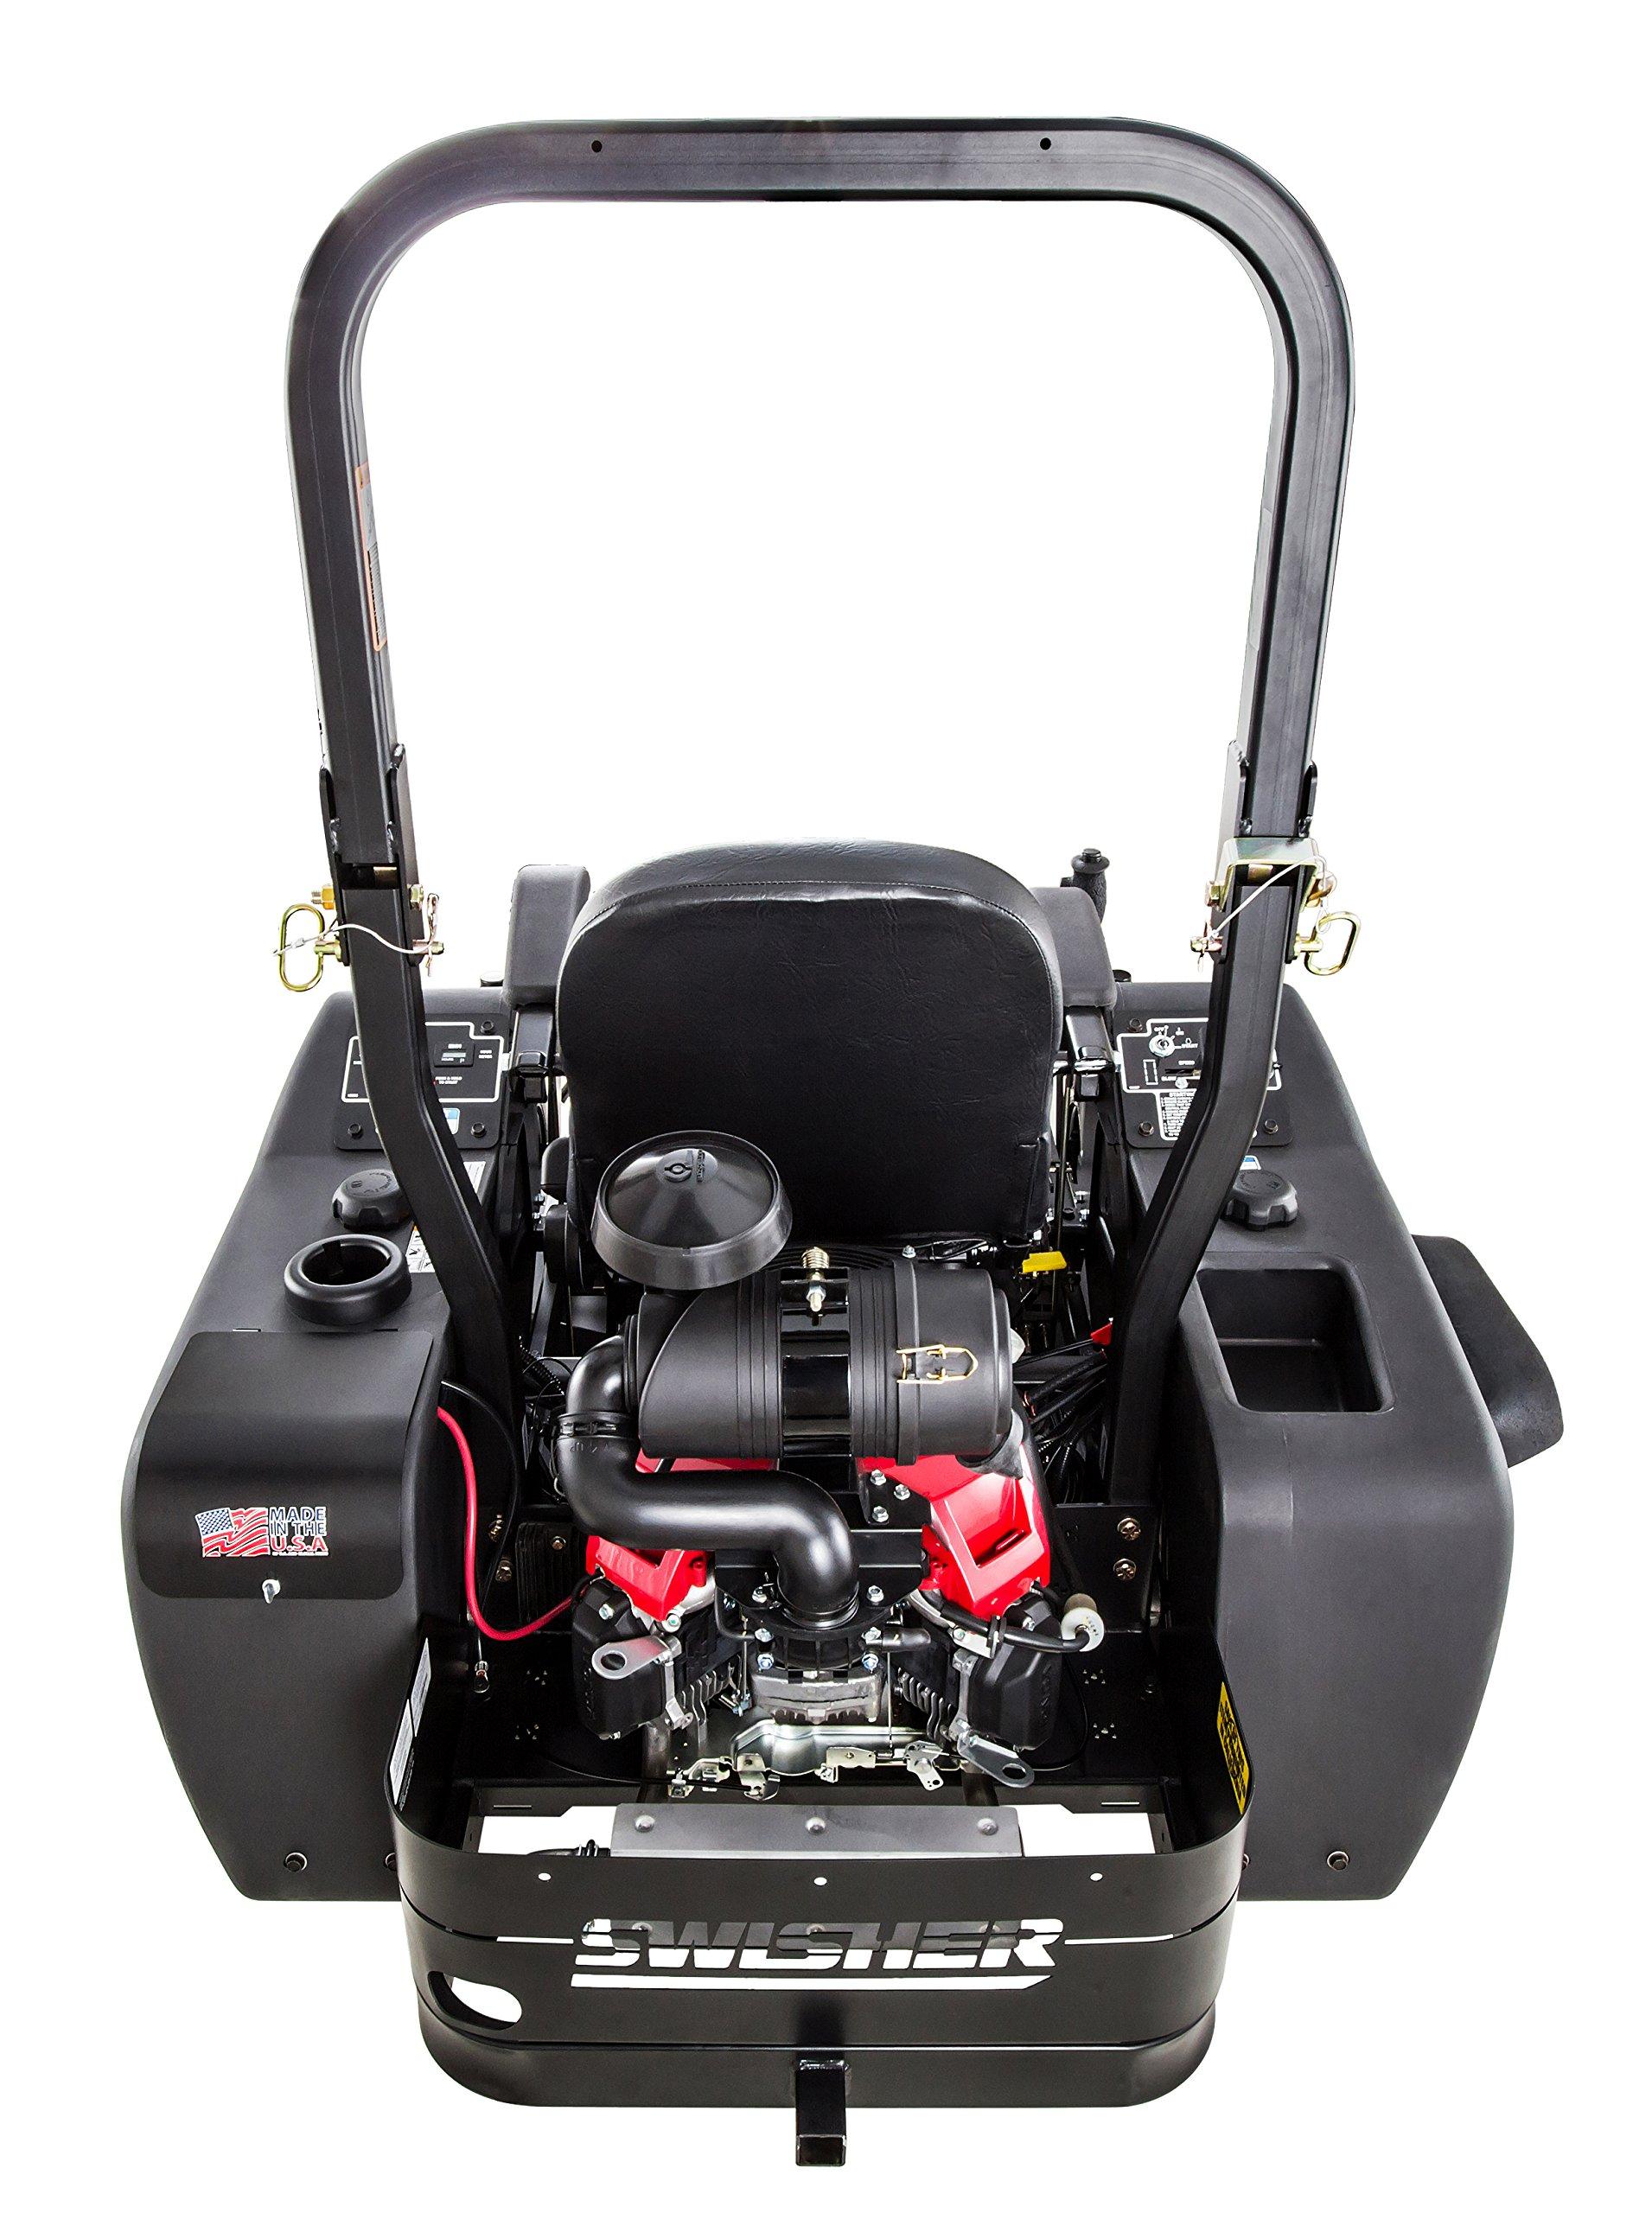 Swisher Z21554CPHO 21.5HP Reponse Gen 2 Honda Ztr Commercial Pro, Black, 54'' by Swisher (Image #7)